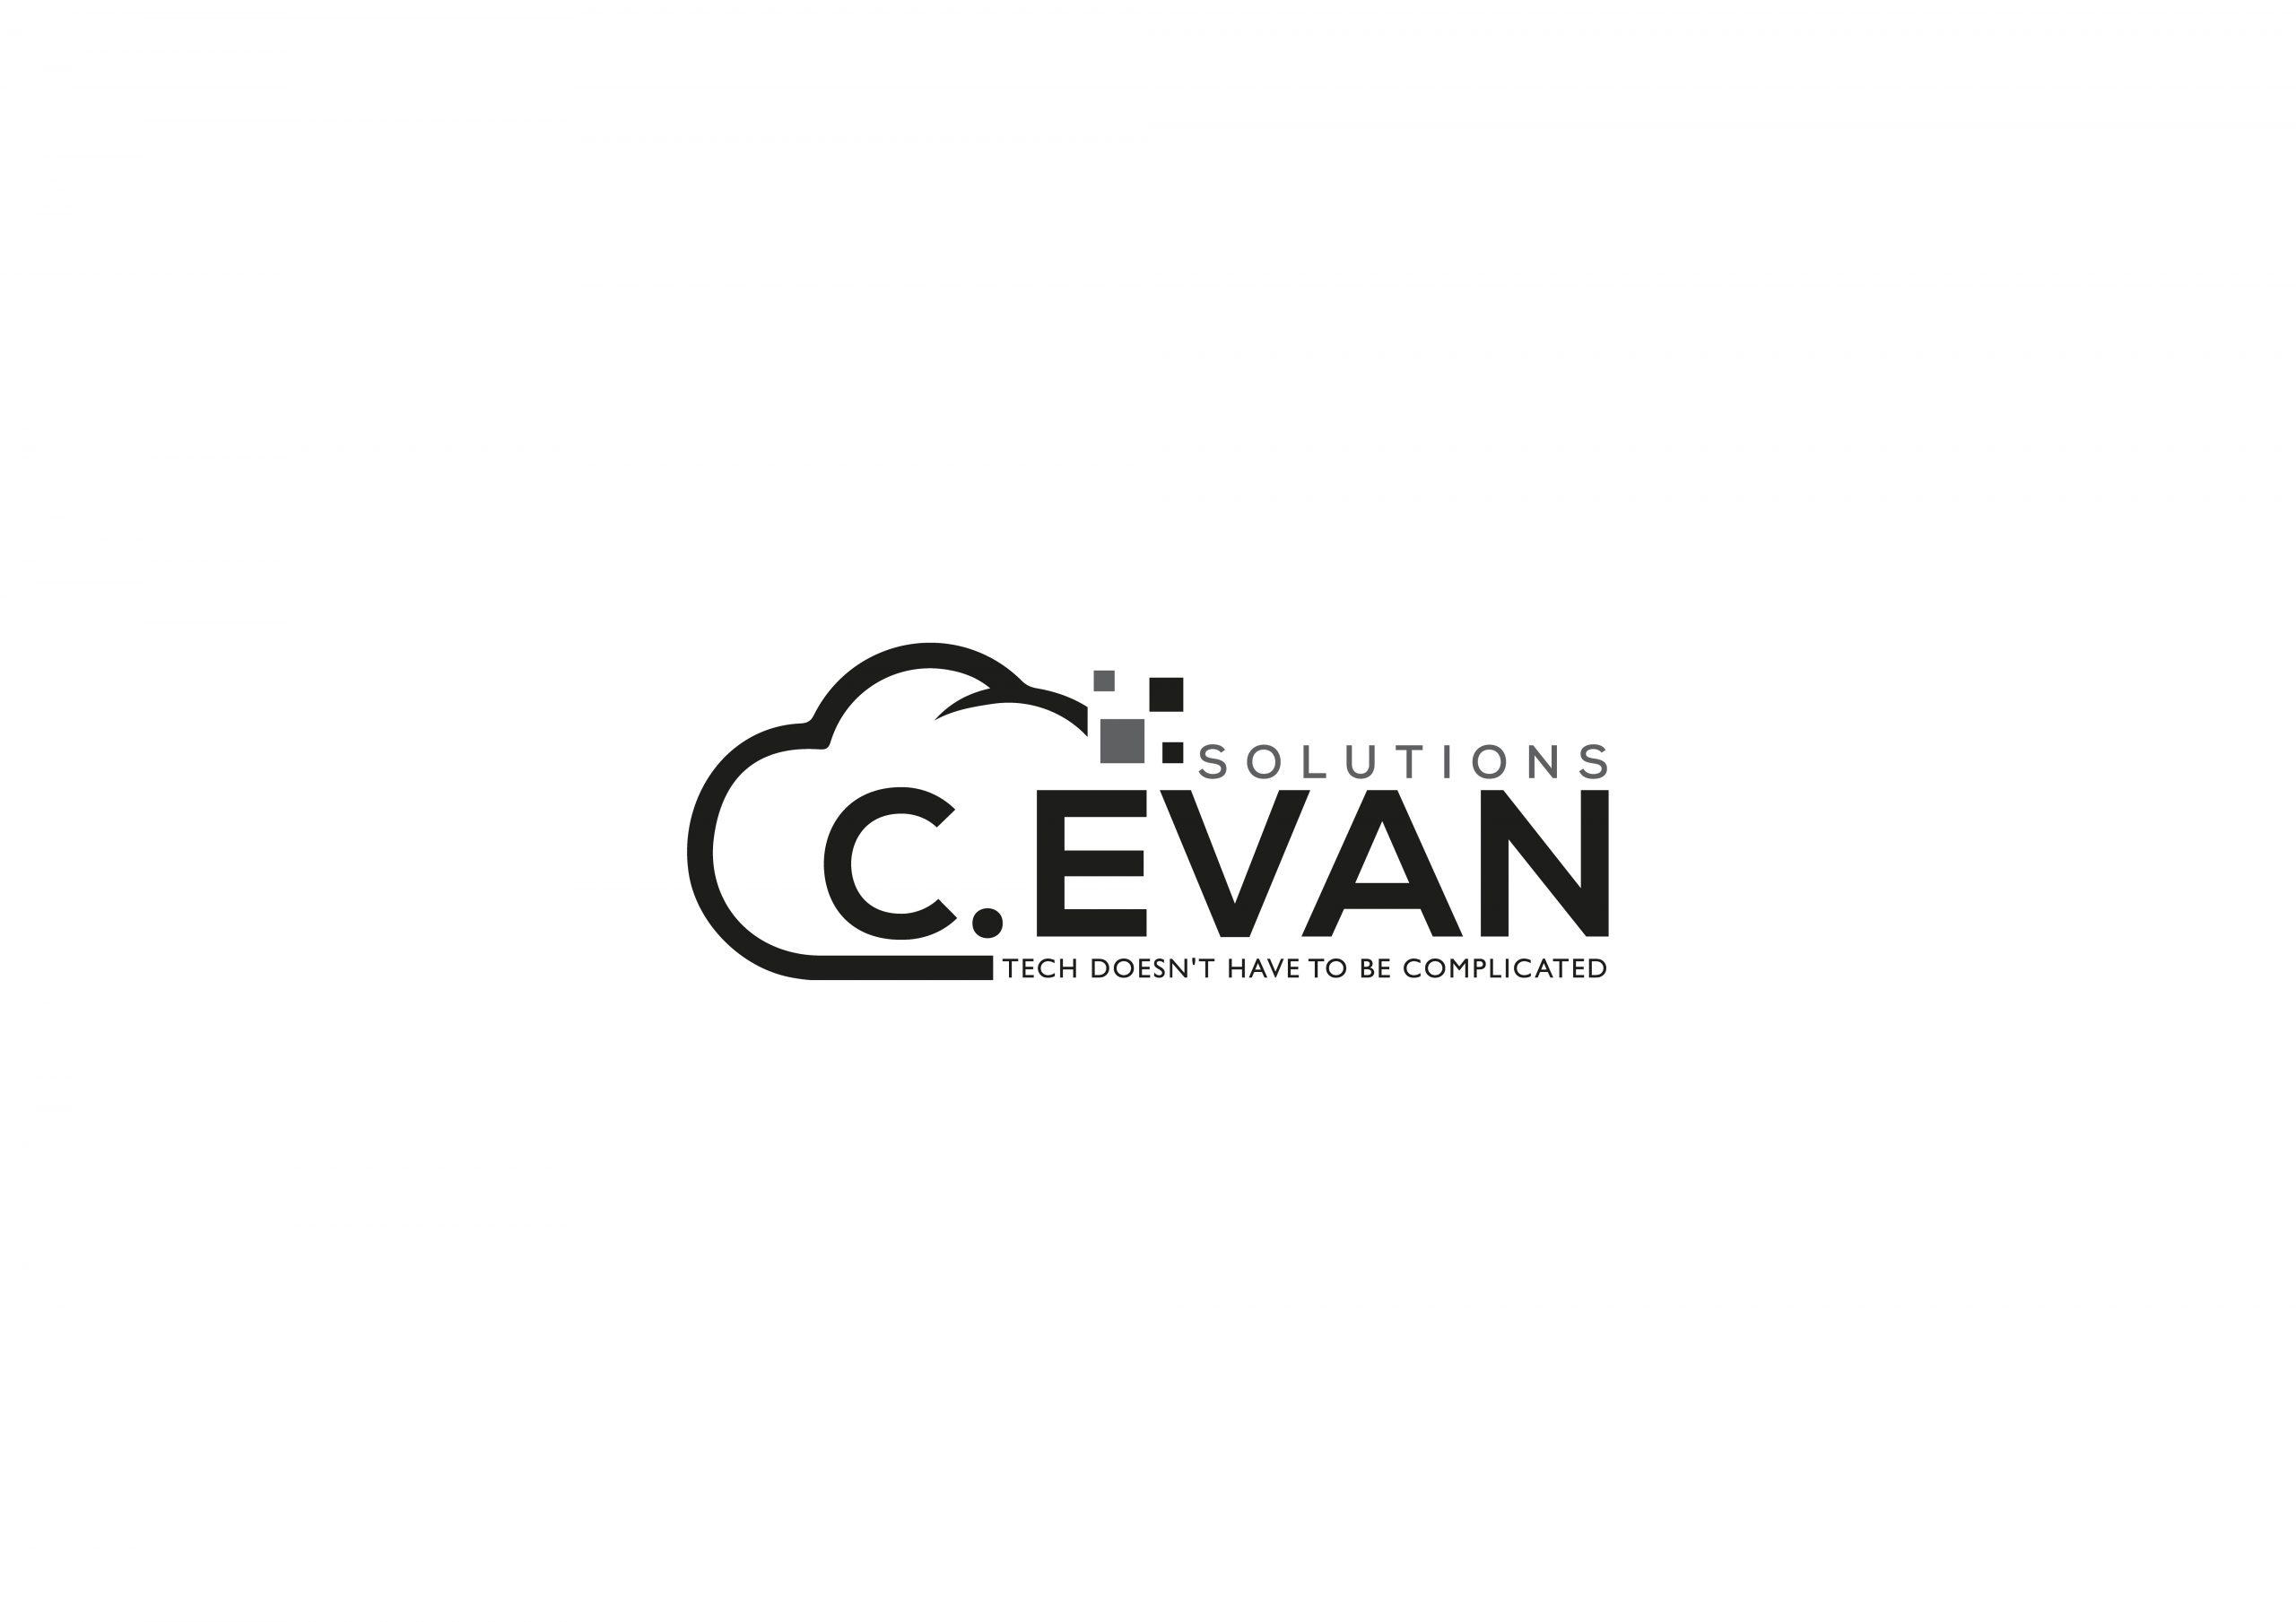 C. Evan Solutions